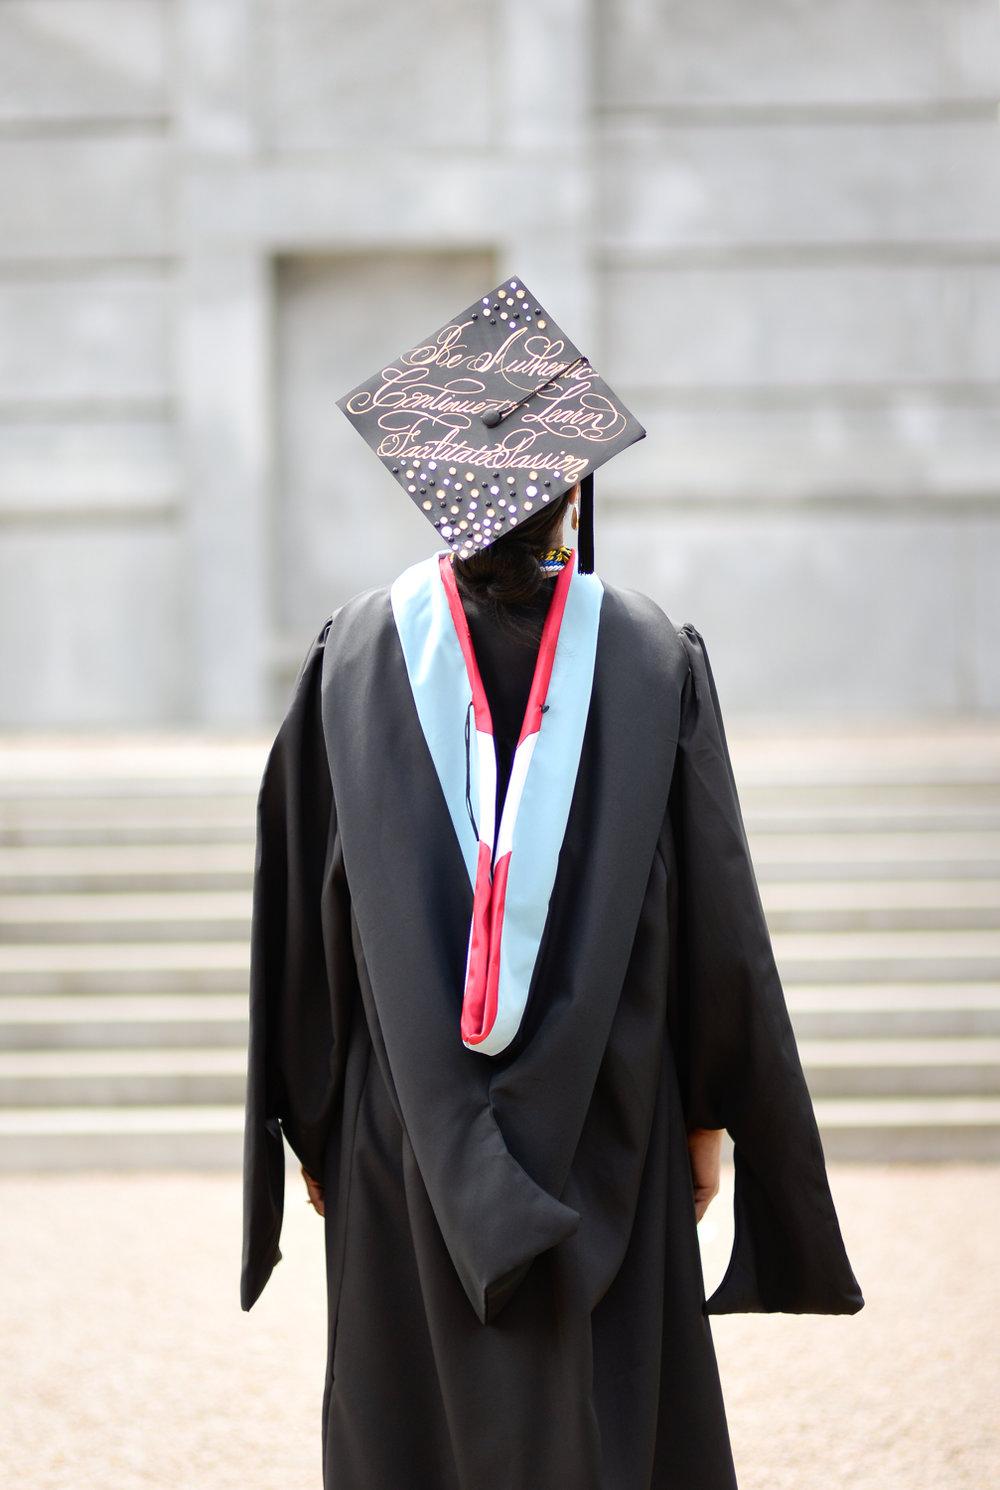 North Carolina State Graduation Cap Calligraphy 5